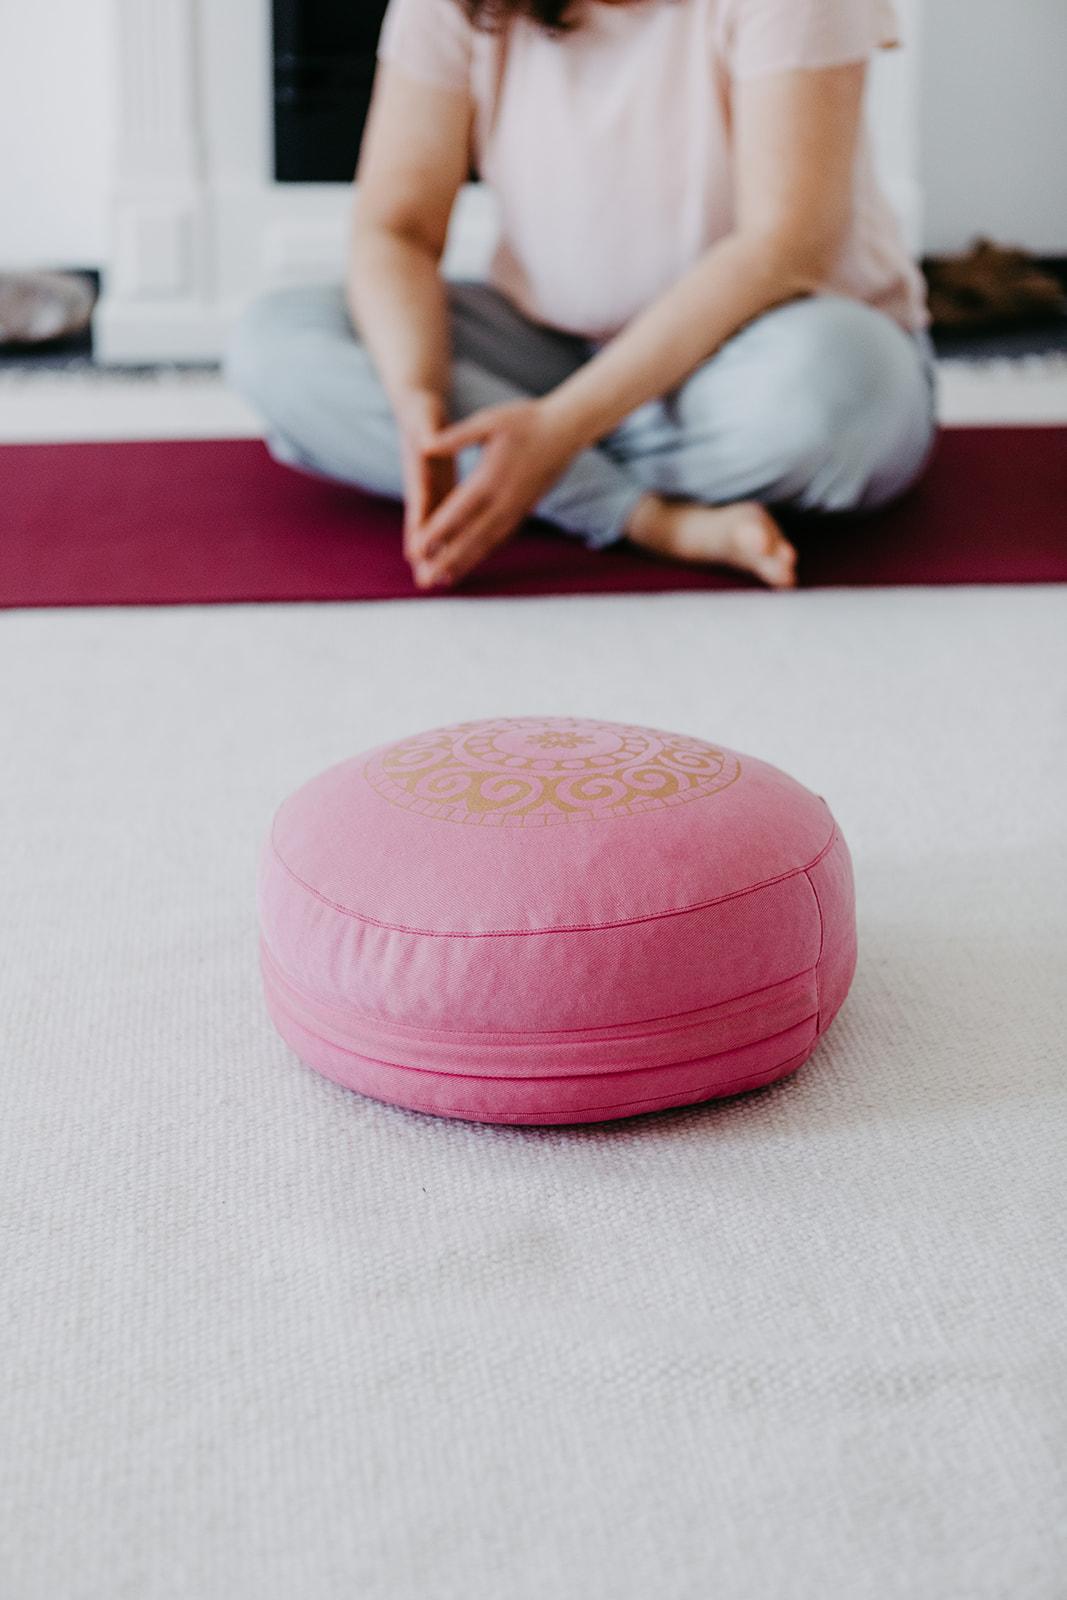 Claudia-Dorn-Yogalehrerin-Yogatherapie-Trauma-Therapeutin